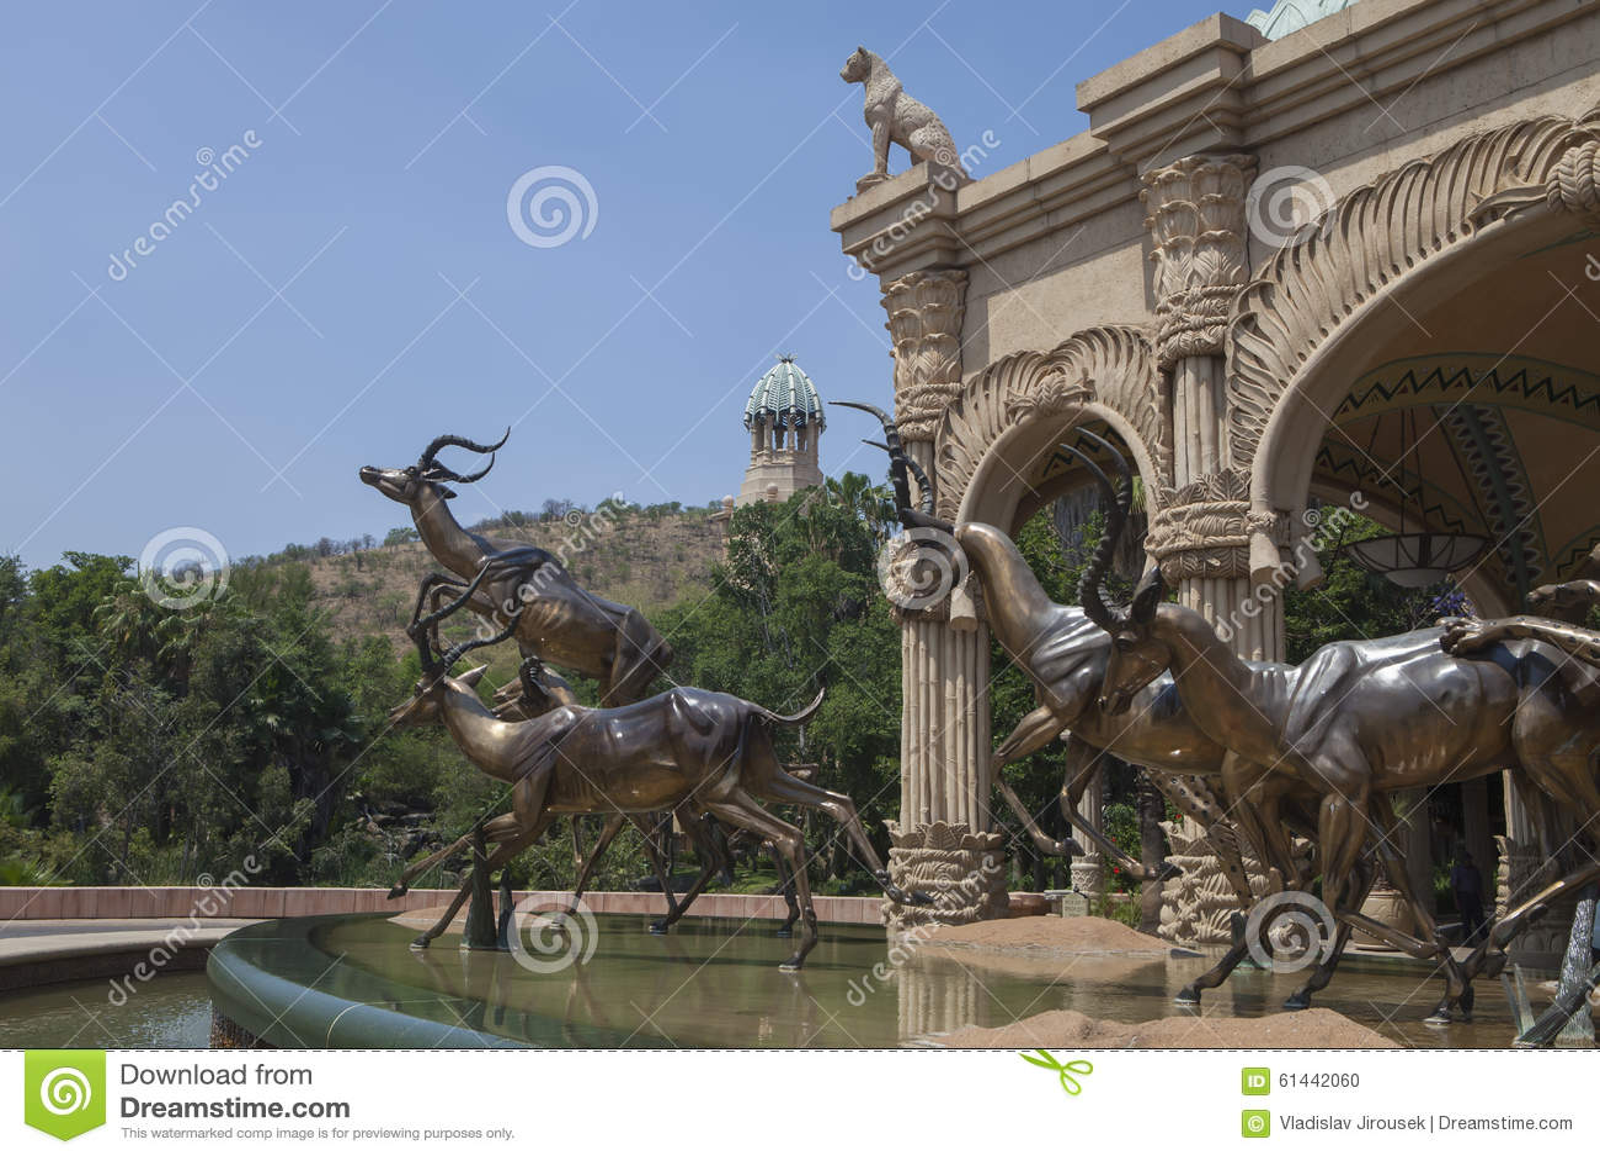 Bronze sculptures of antelopes, Sun City, South Africa